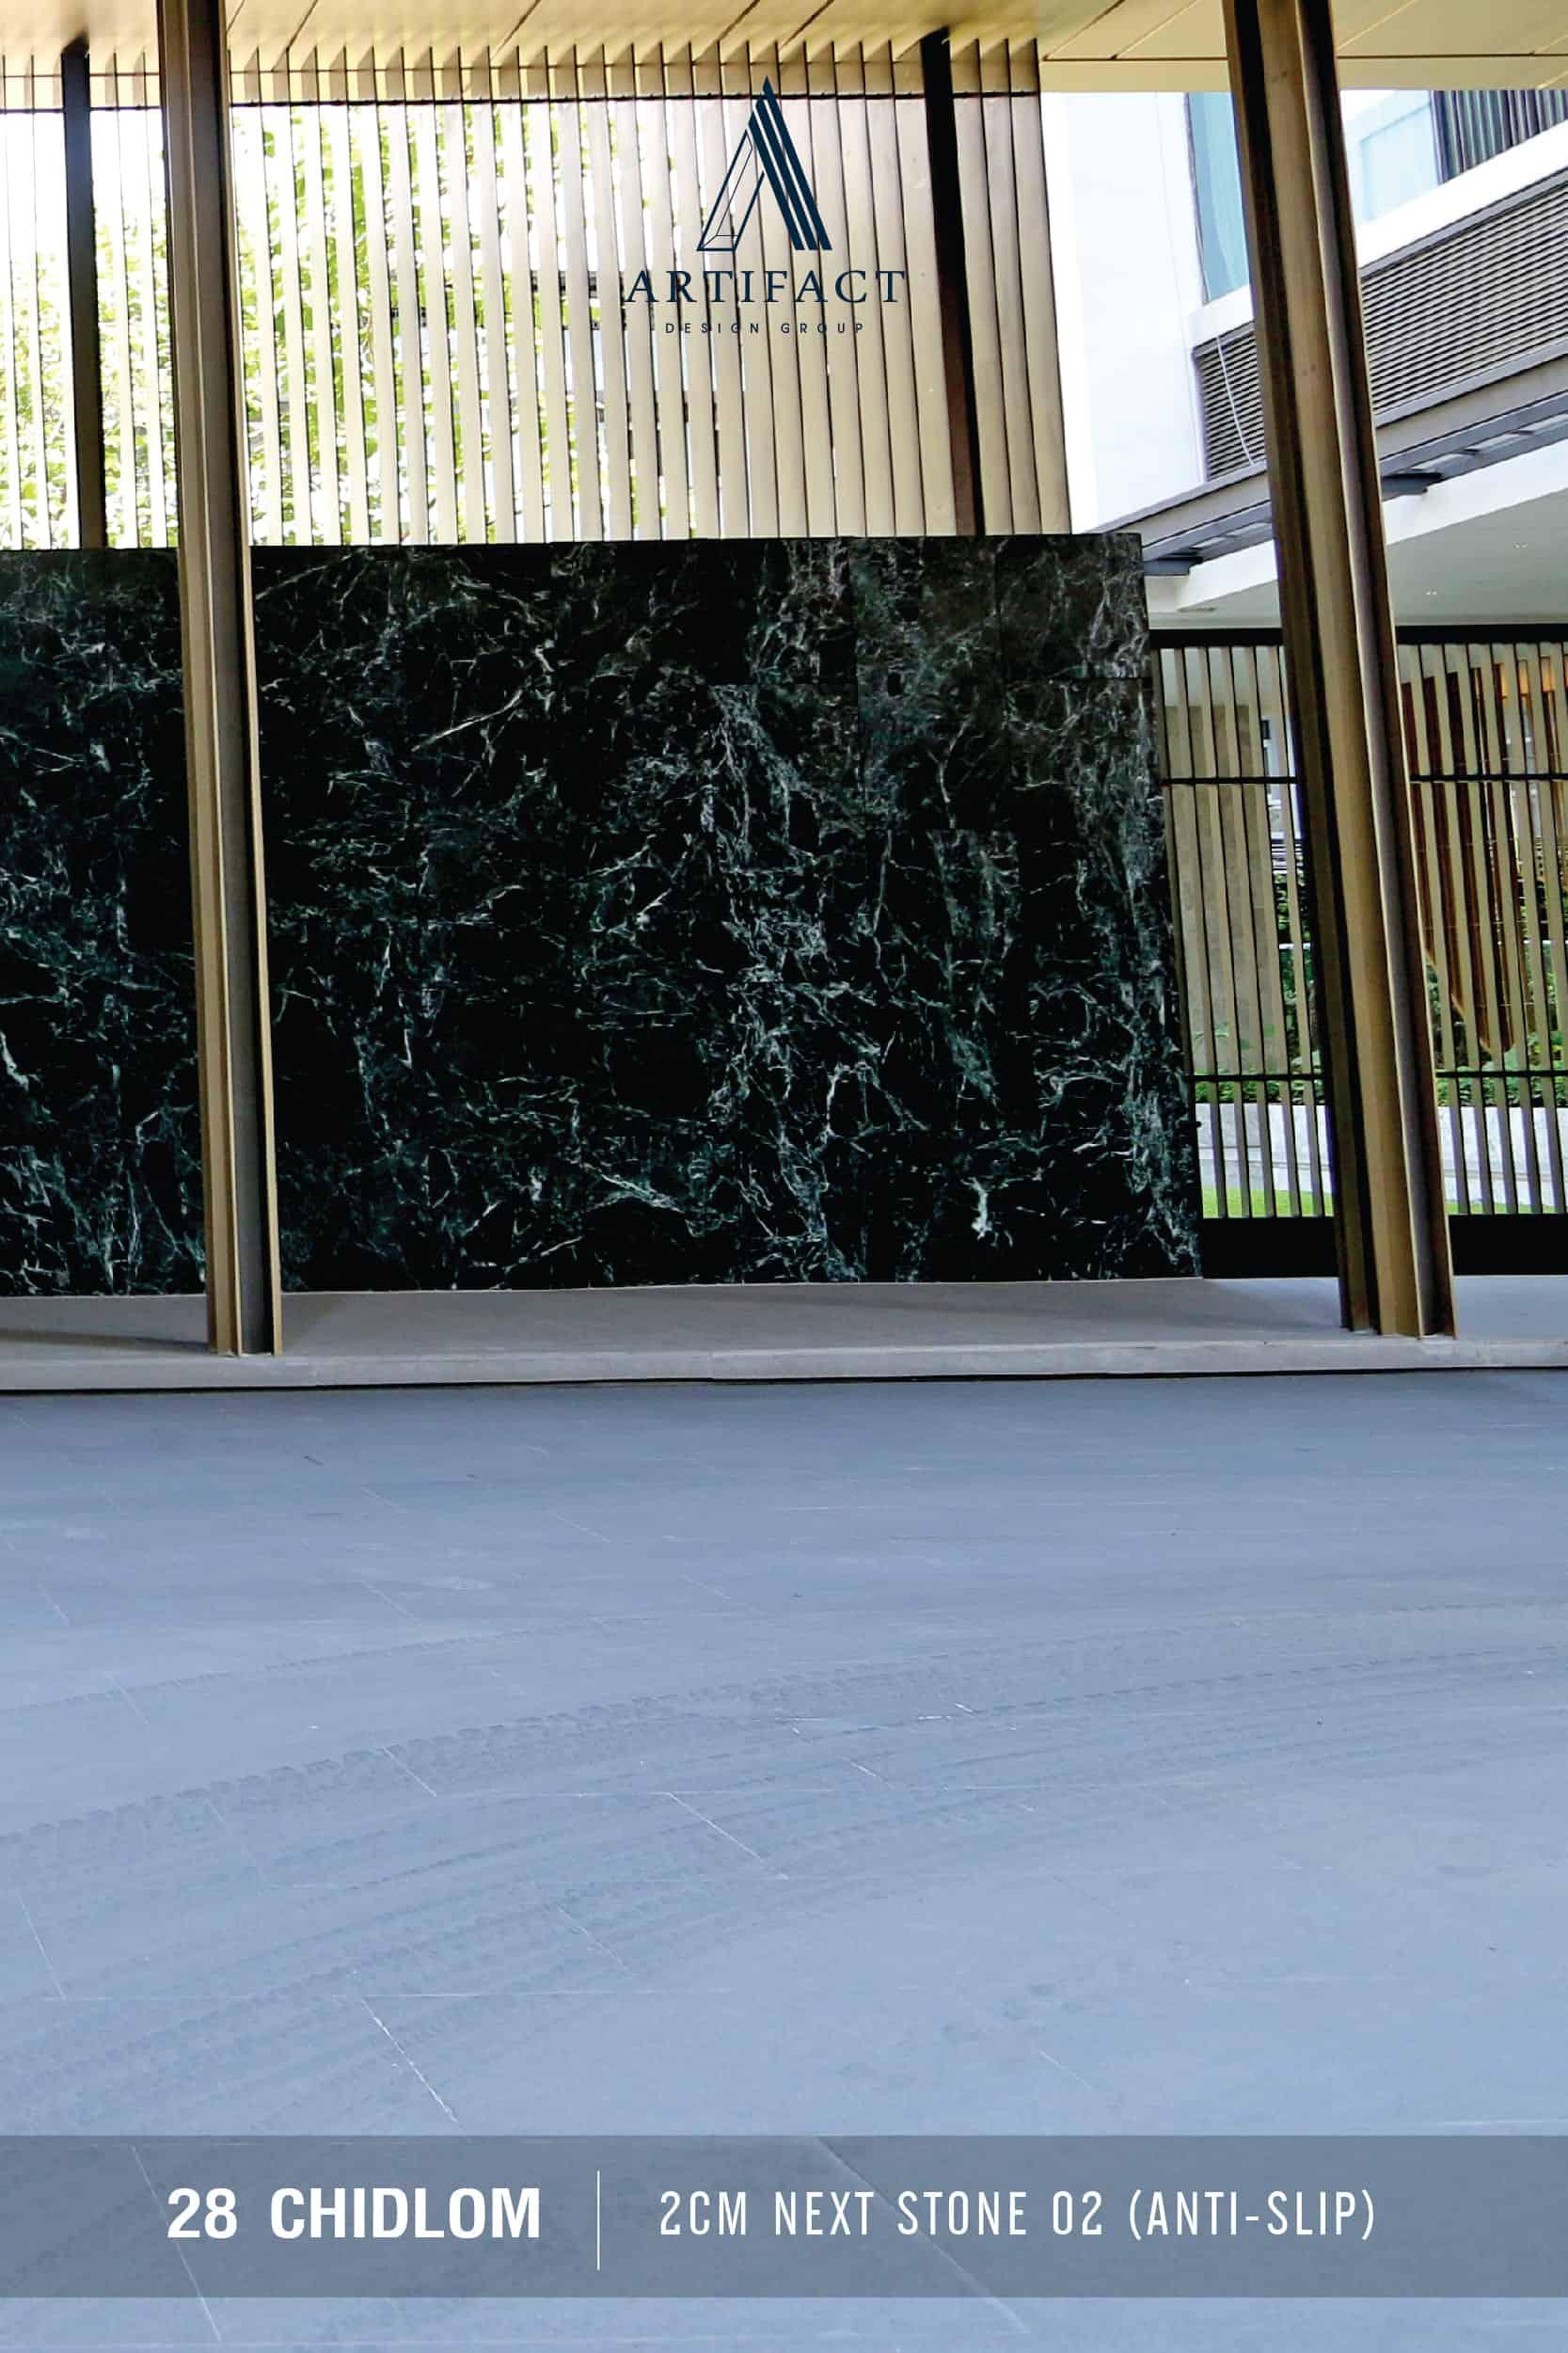 28 Chidlom เลือกใช้ กระเบื้อง artifact Granite Stone 02 และ Granite Stone 03